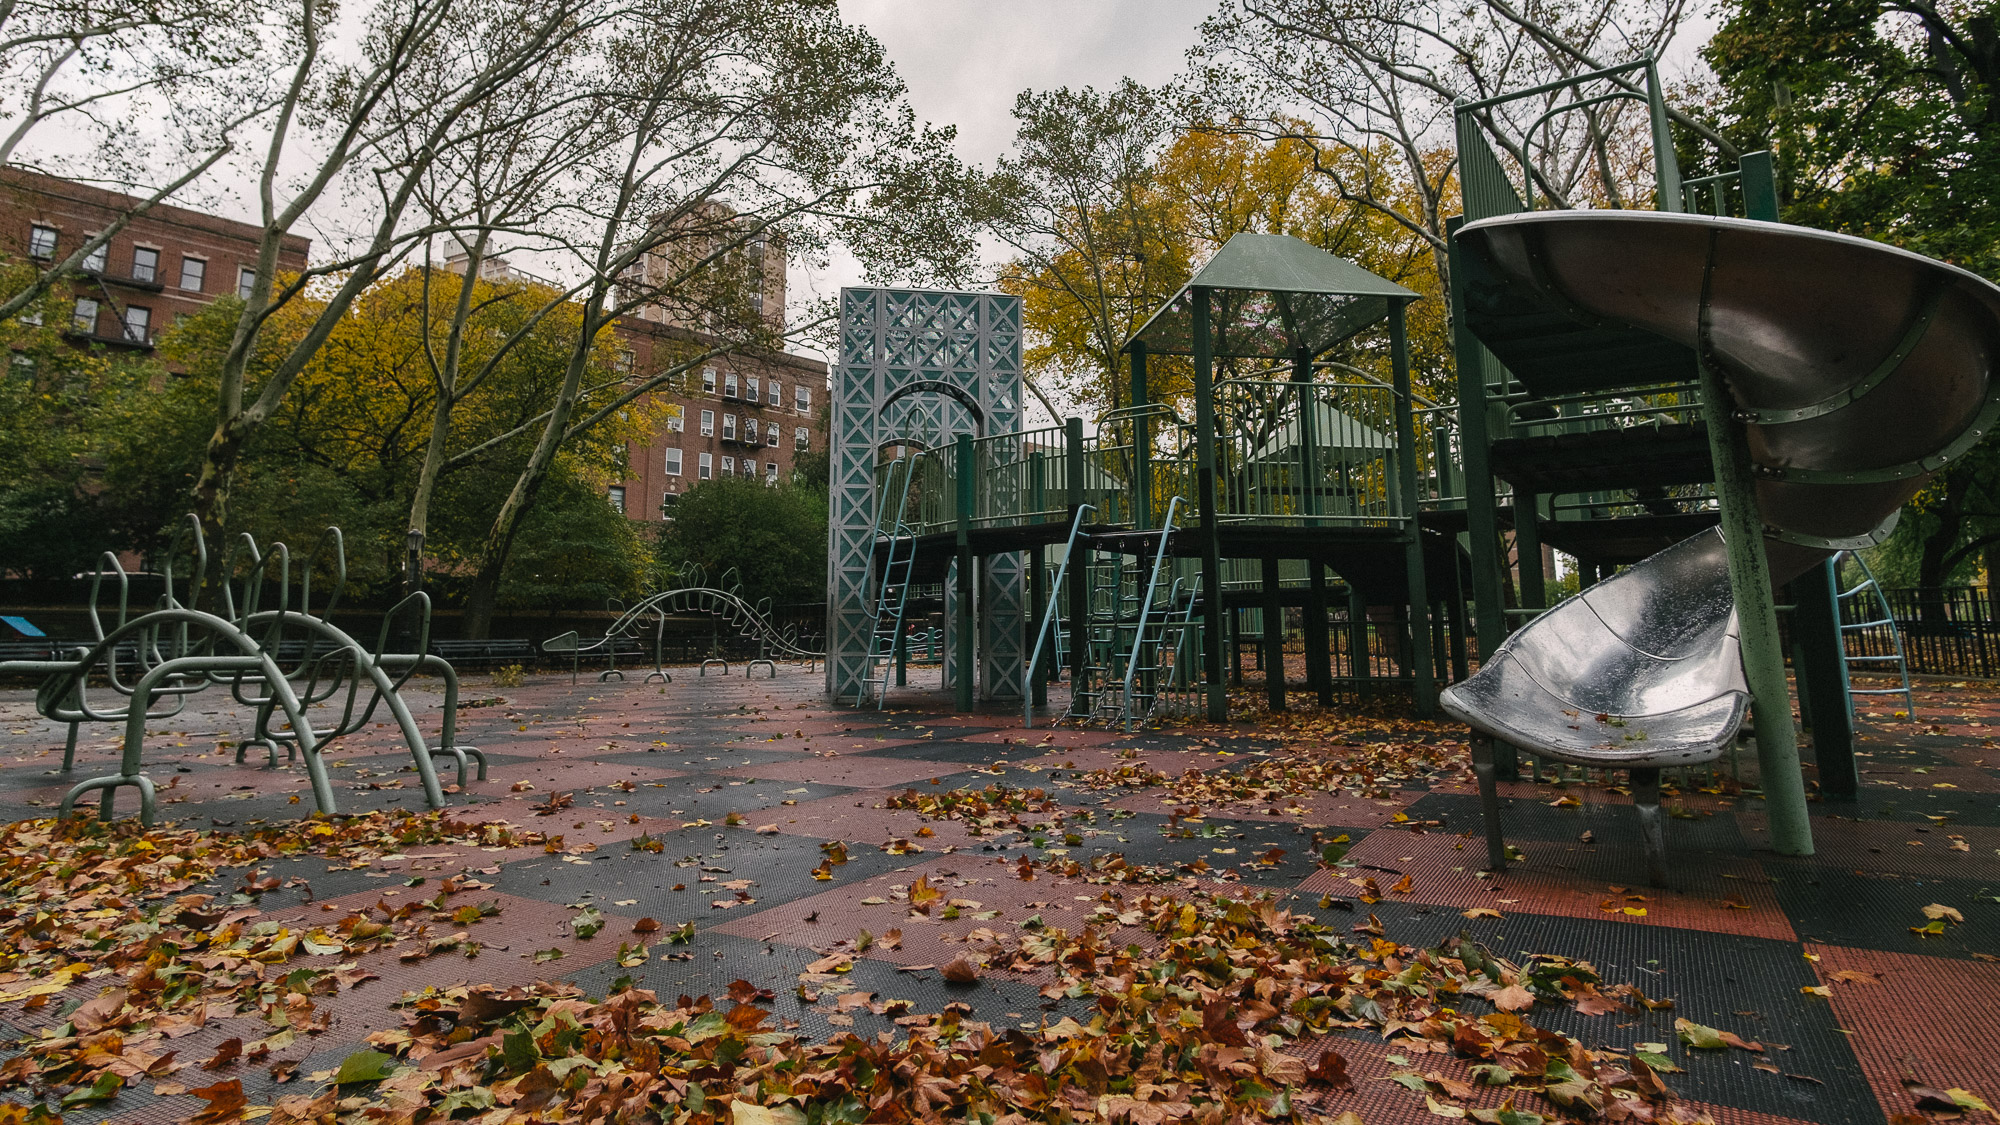 A park in Washington Heights, Manhattan. Fuji X-pro1, Rokinon 12mm f/2.